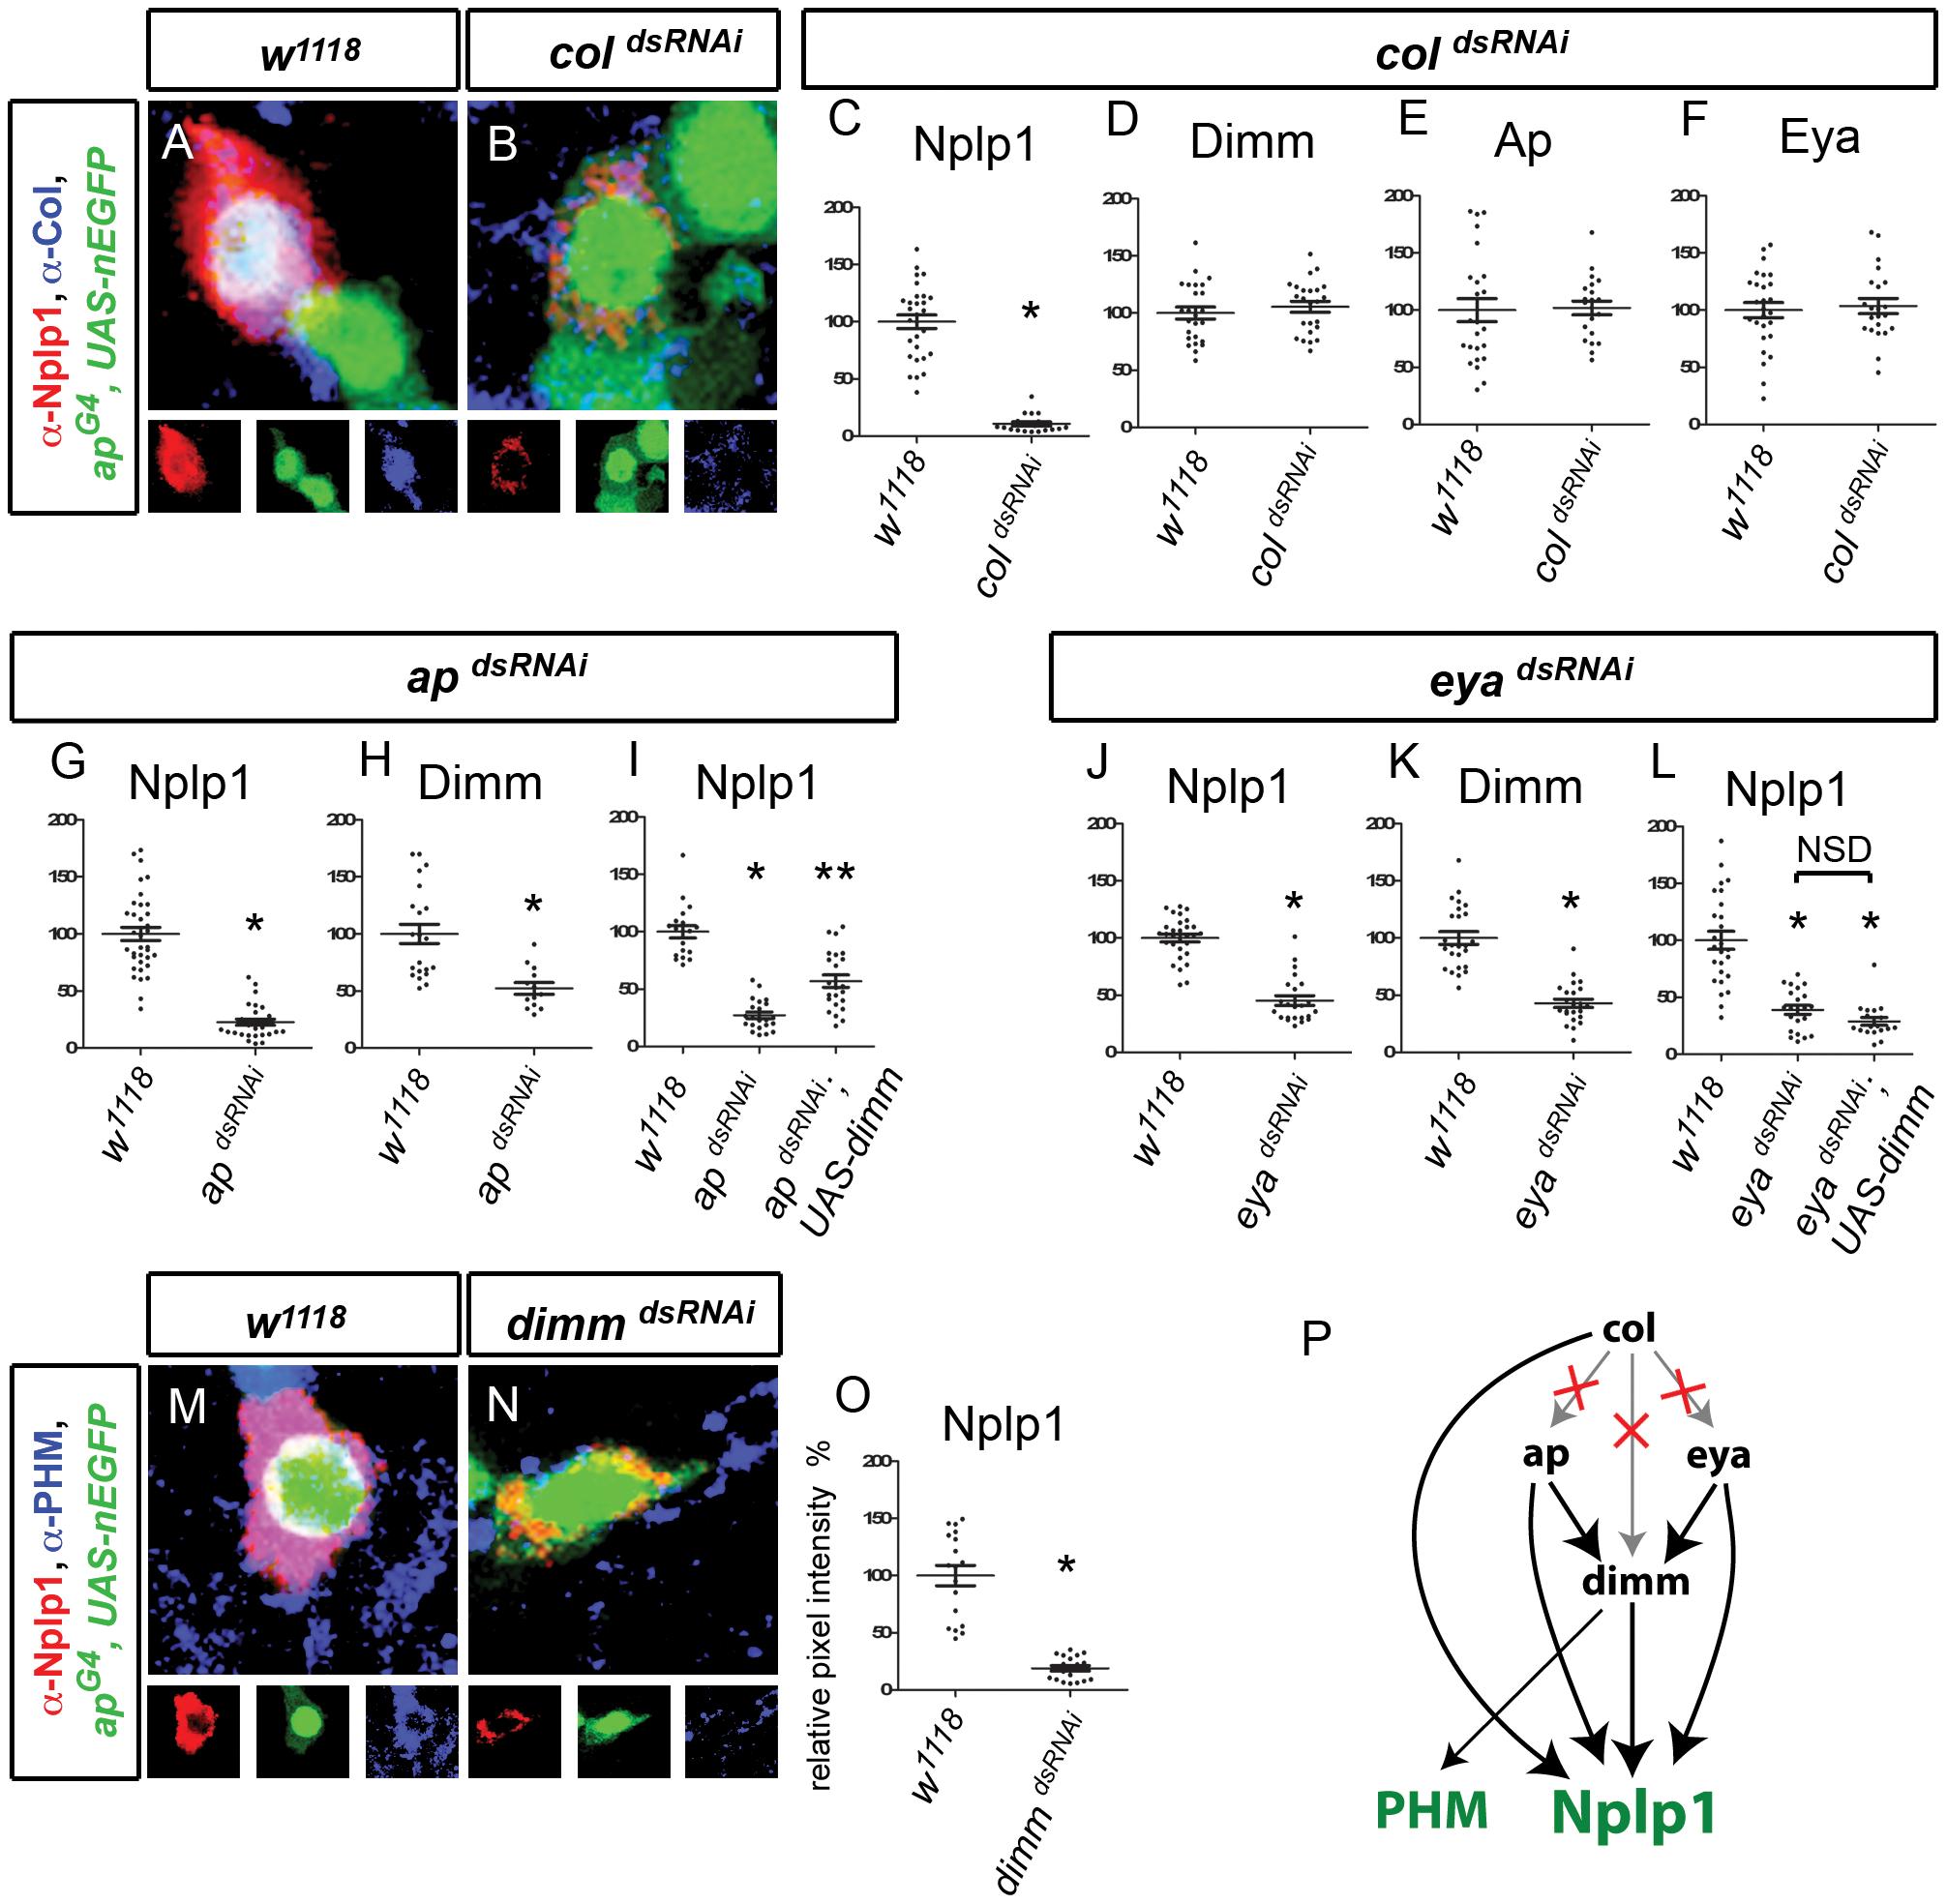 Transcriptional regulation of Nplp1 in adult Tv1 neurons.